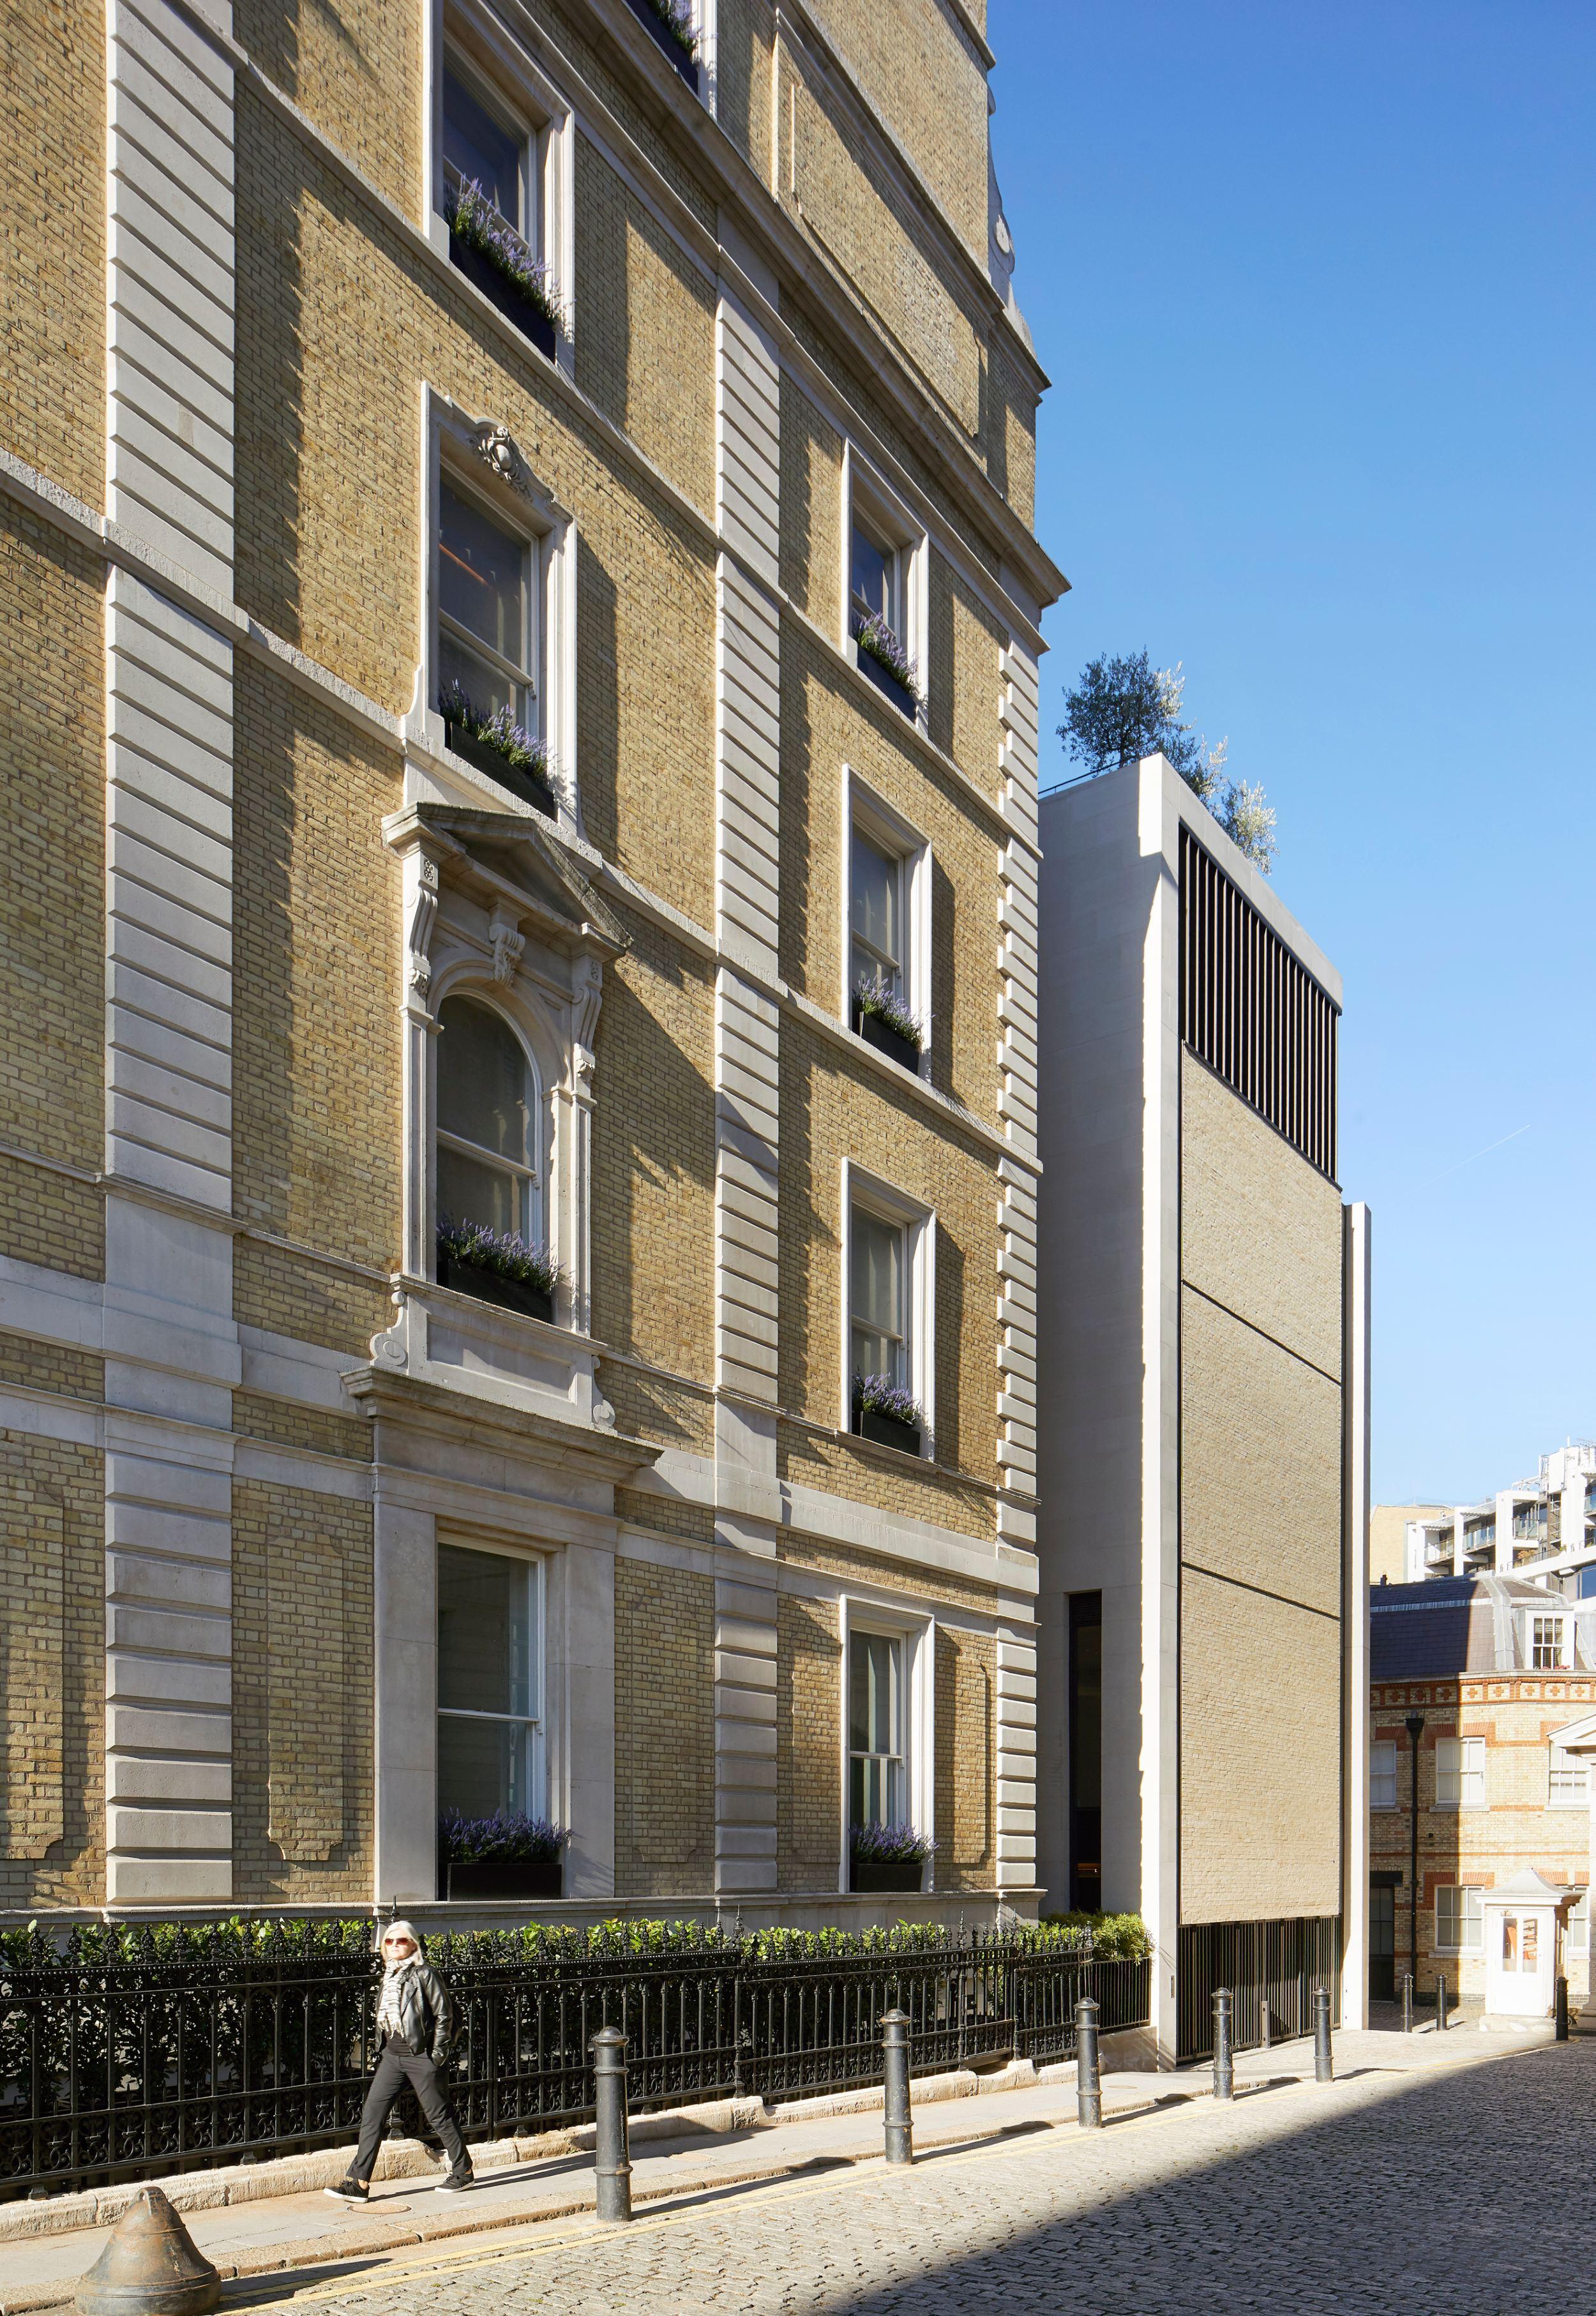 Flanagan Lawrence_Grosvenor Crescent_London_©Hufton+Crow_014 (1).jpg